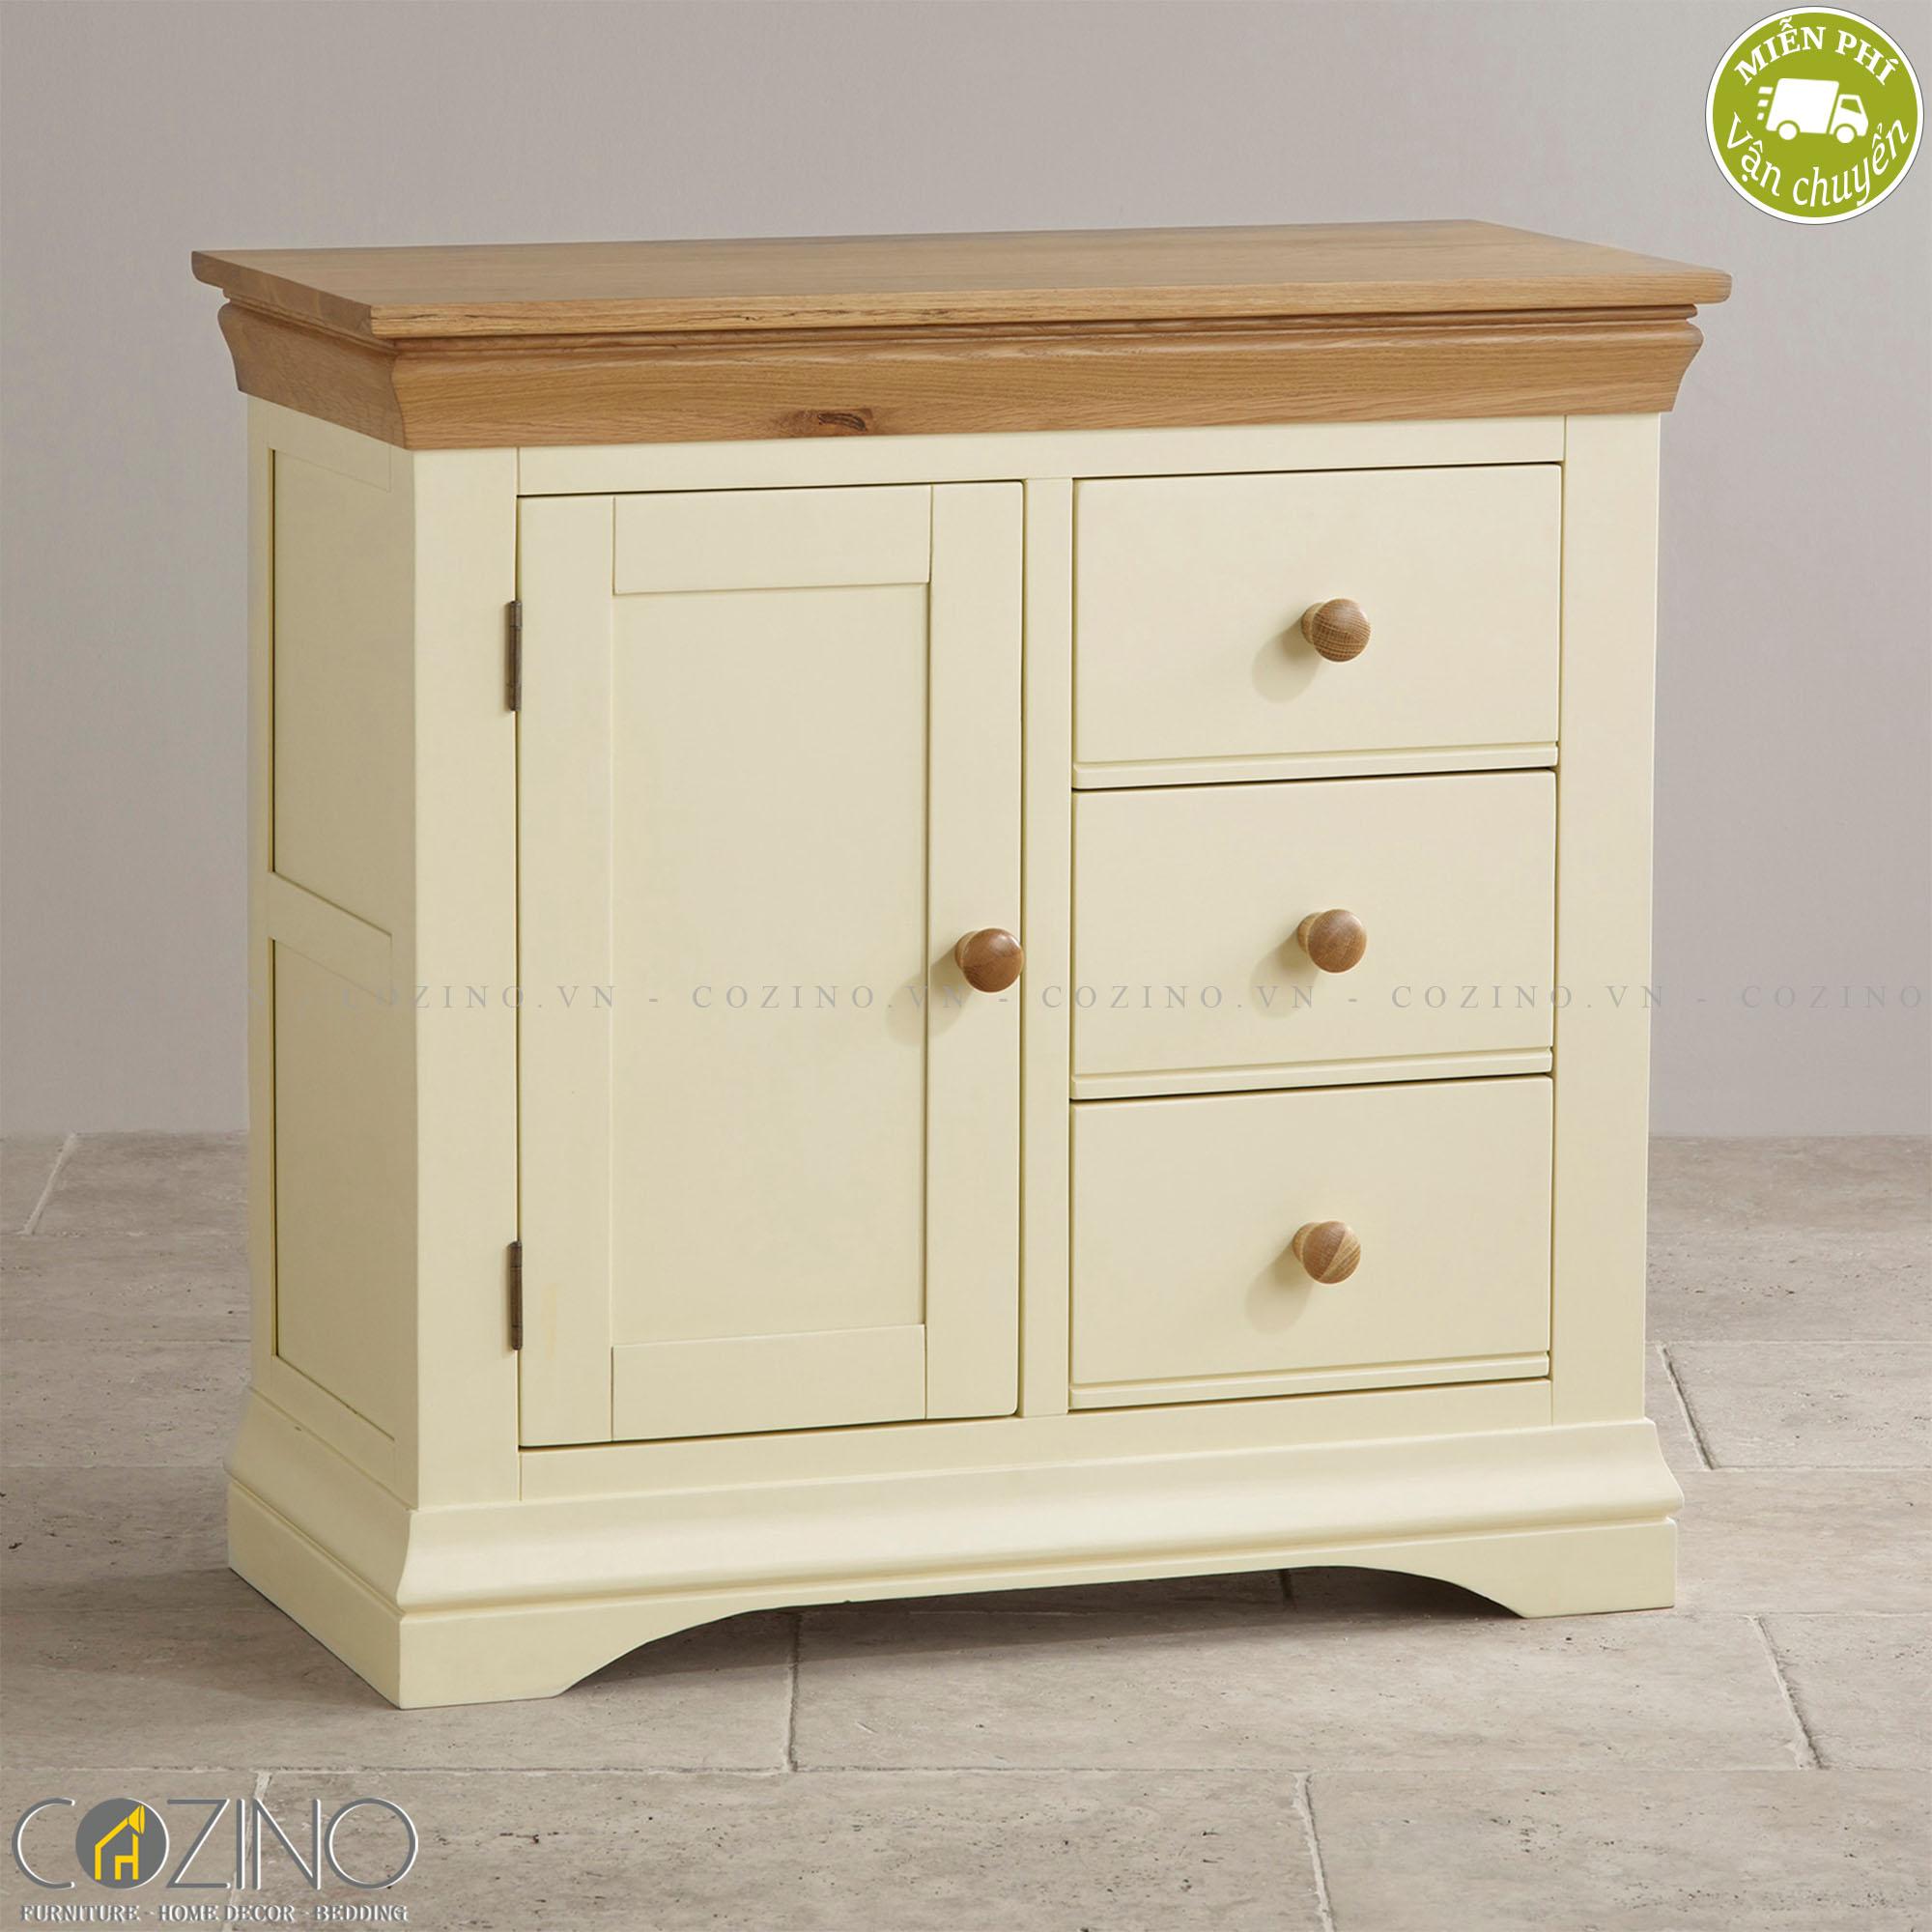 Tủ lưu trữ Canary gỗ sồi - Cozino